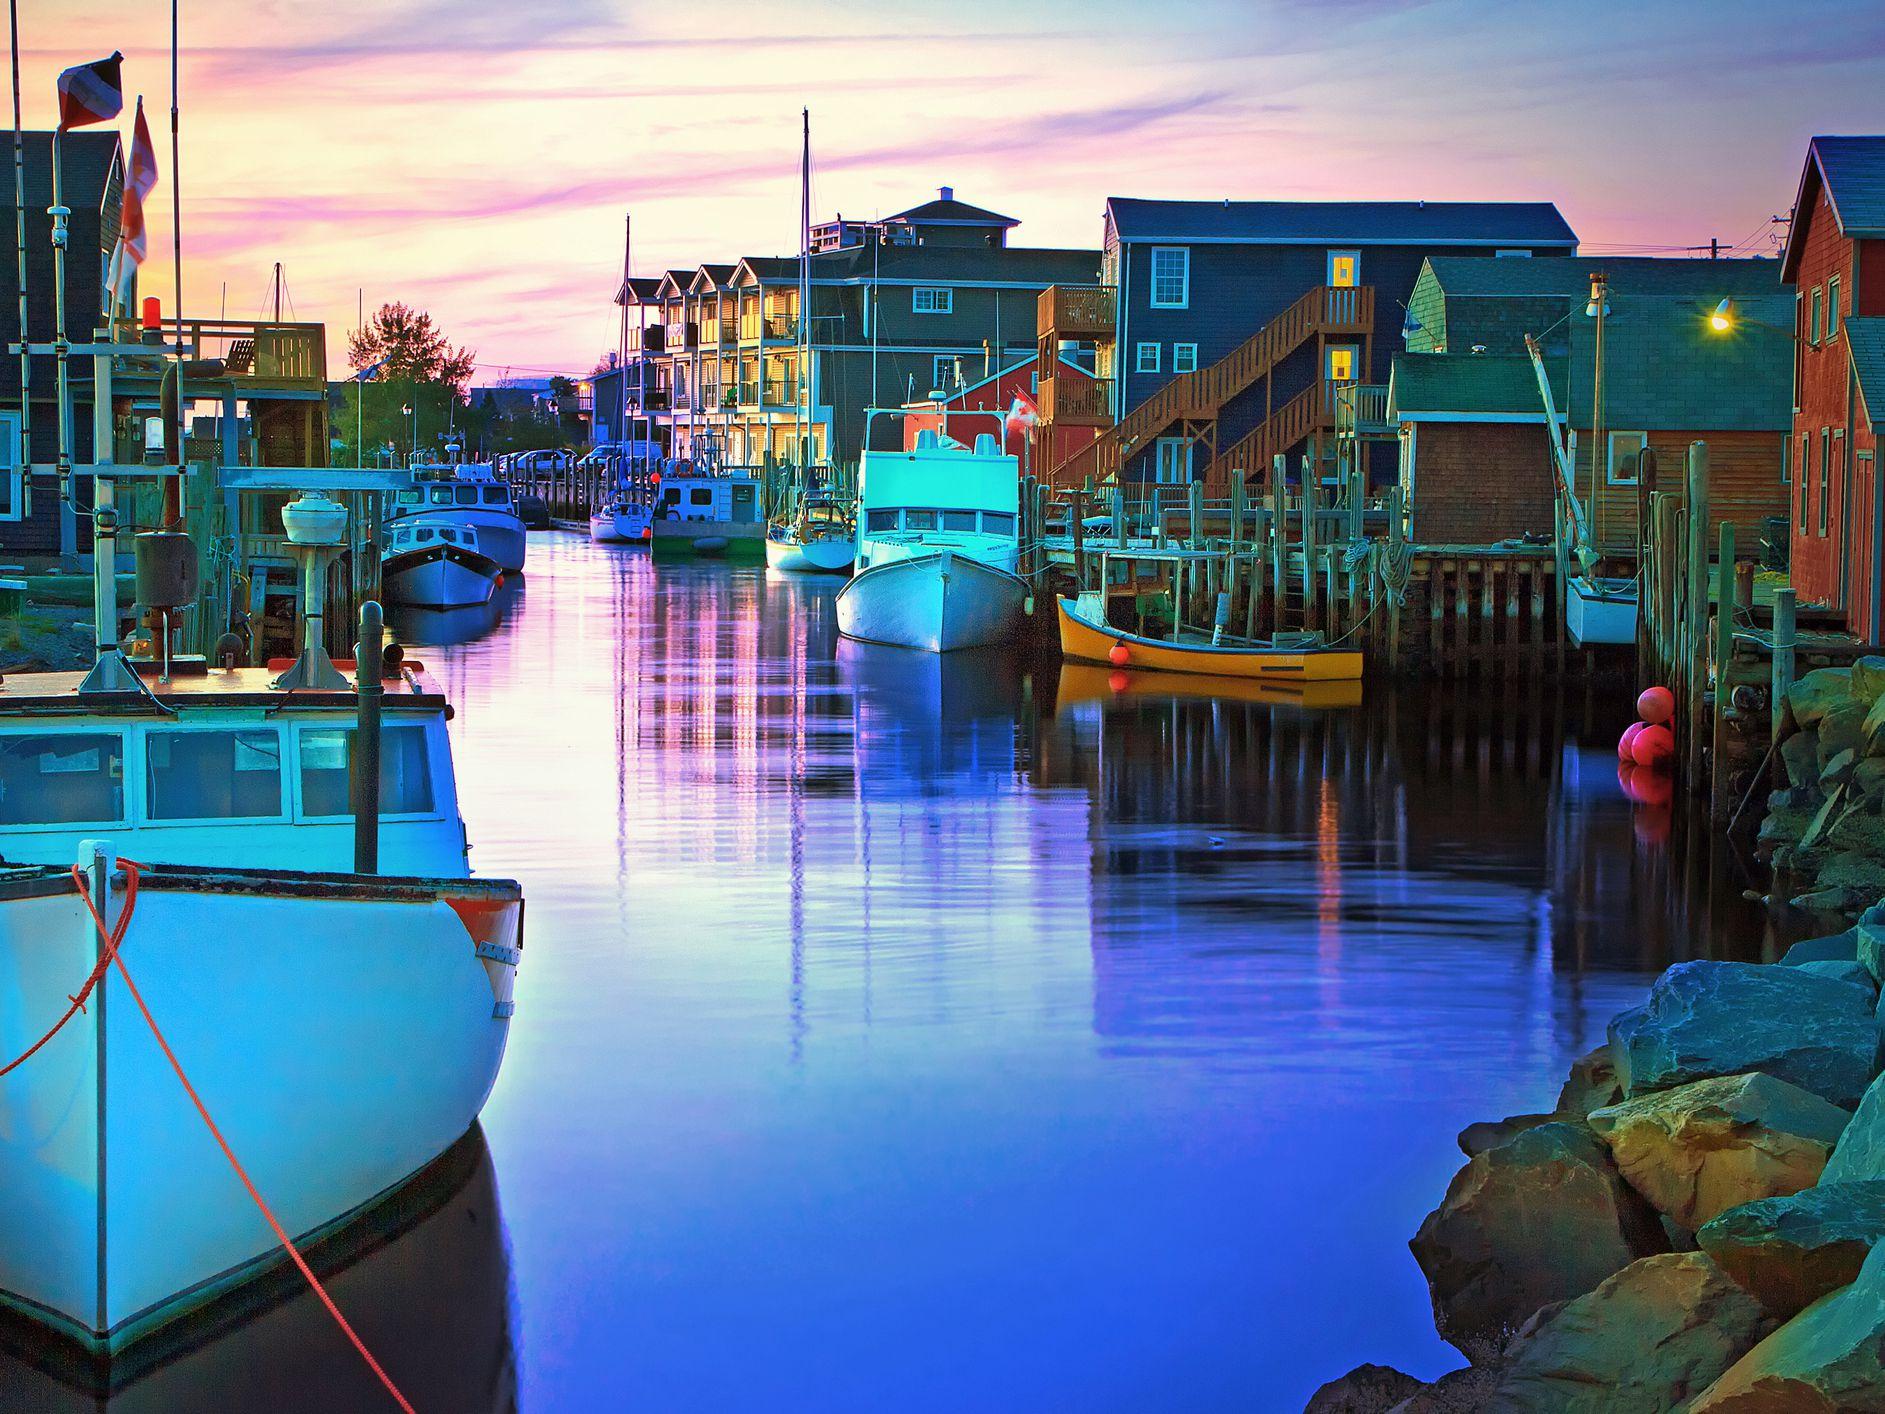 5 of the Best RV Parks in Nova Scotia